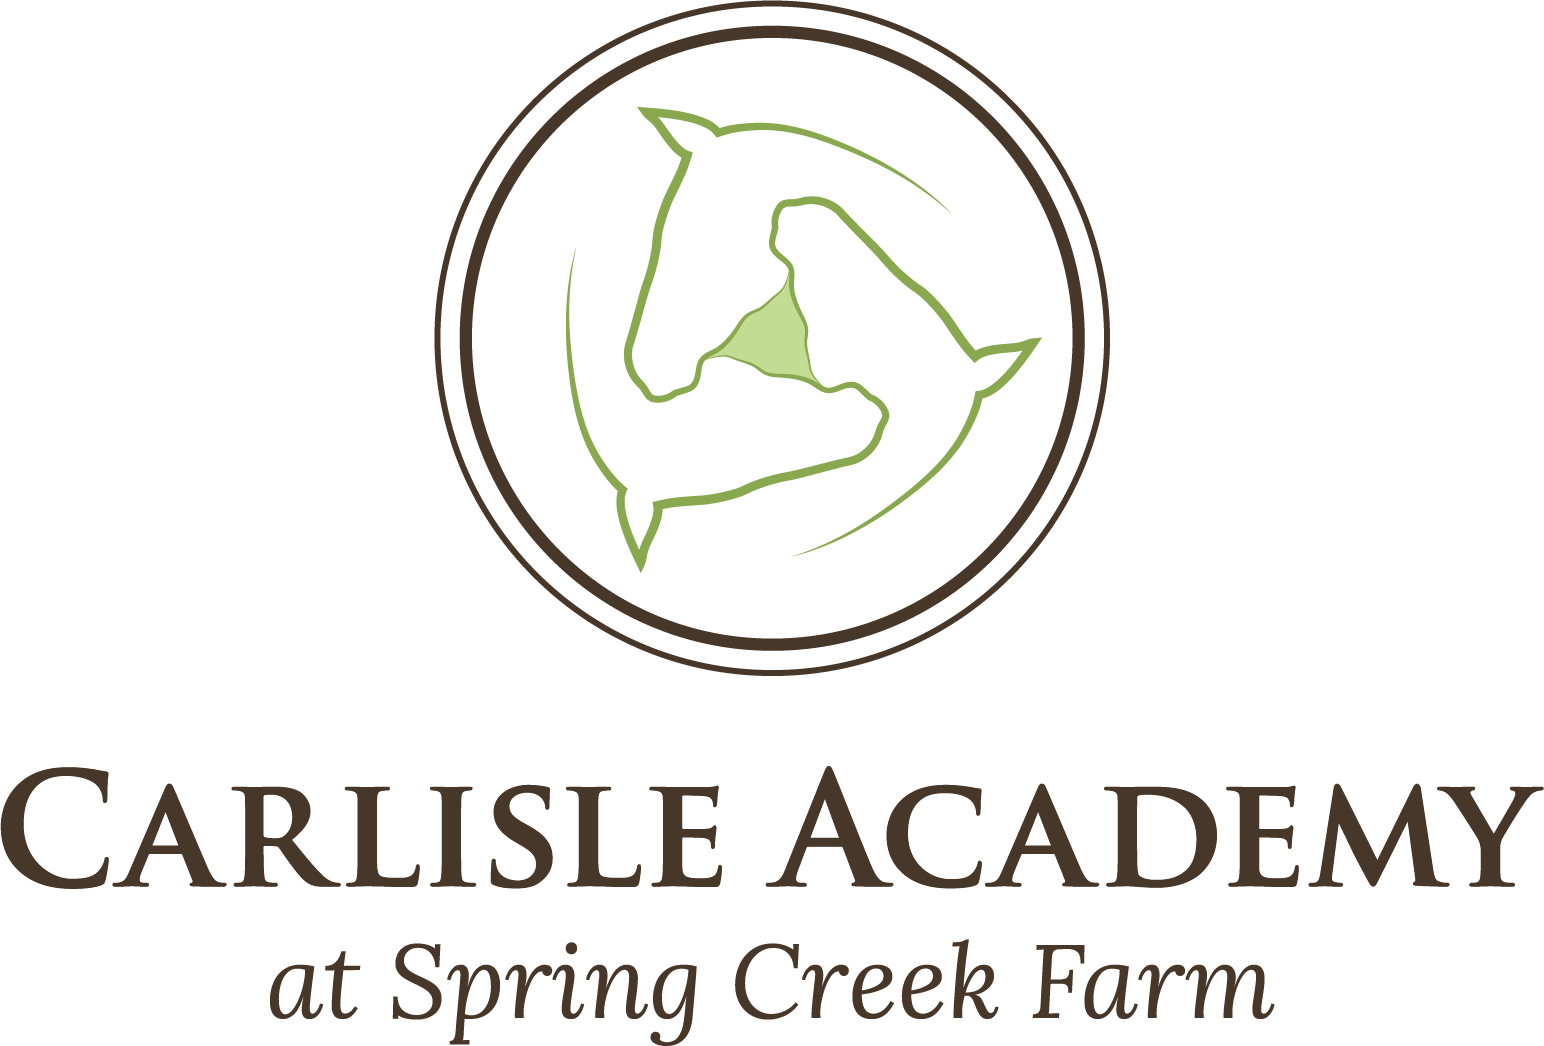 Carlisle Academy at Spring Creek Farm logo